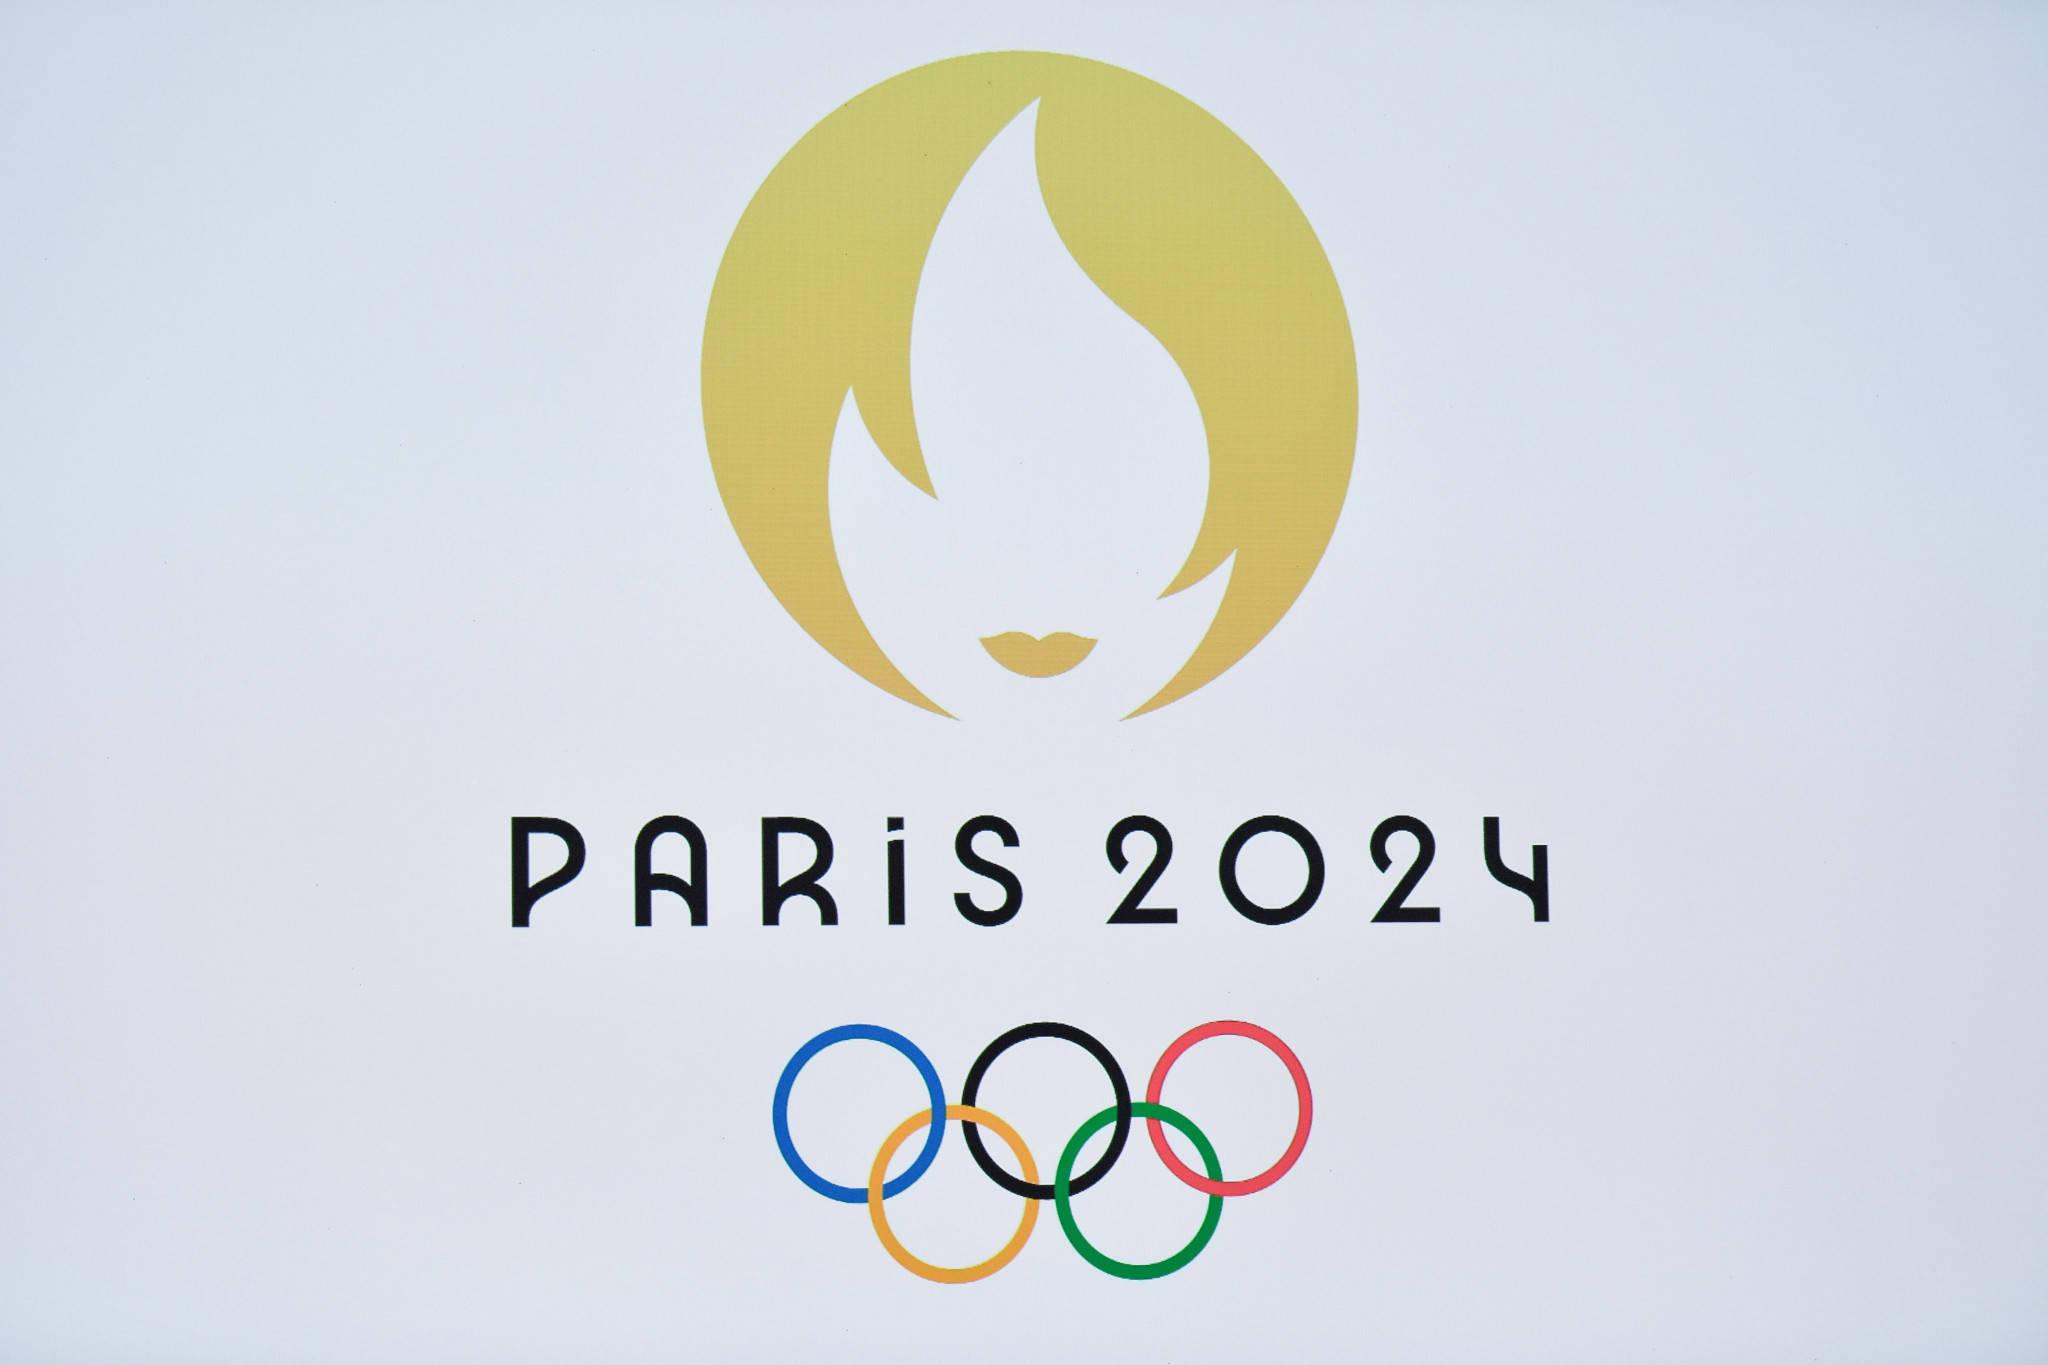 <b>2024巴黎奥运或迎新项目 混合接力越野有望回归</b>